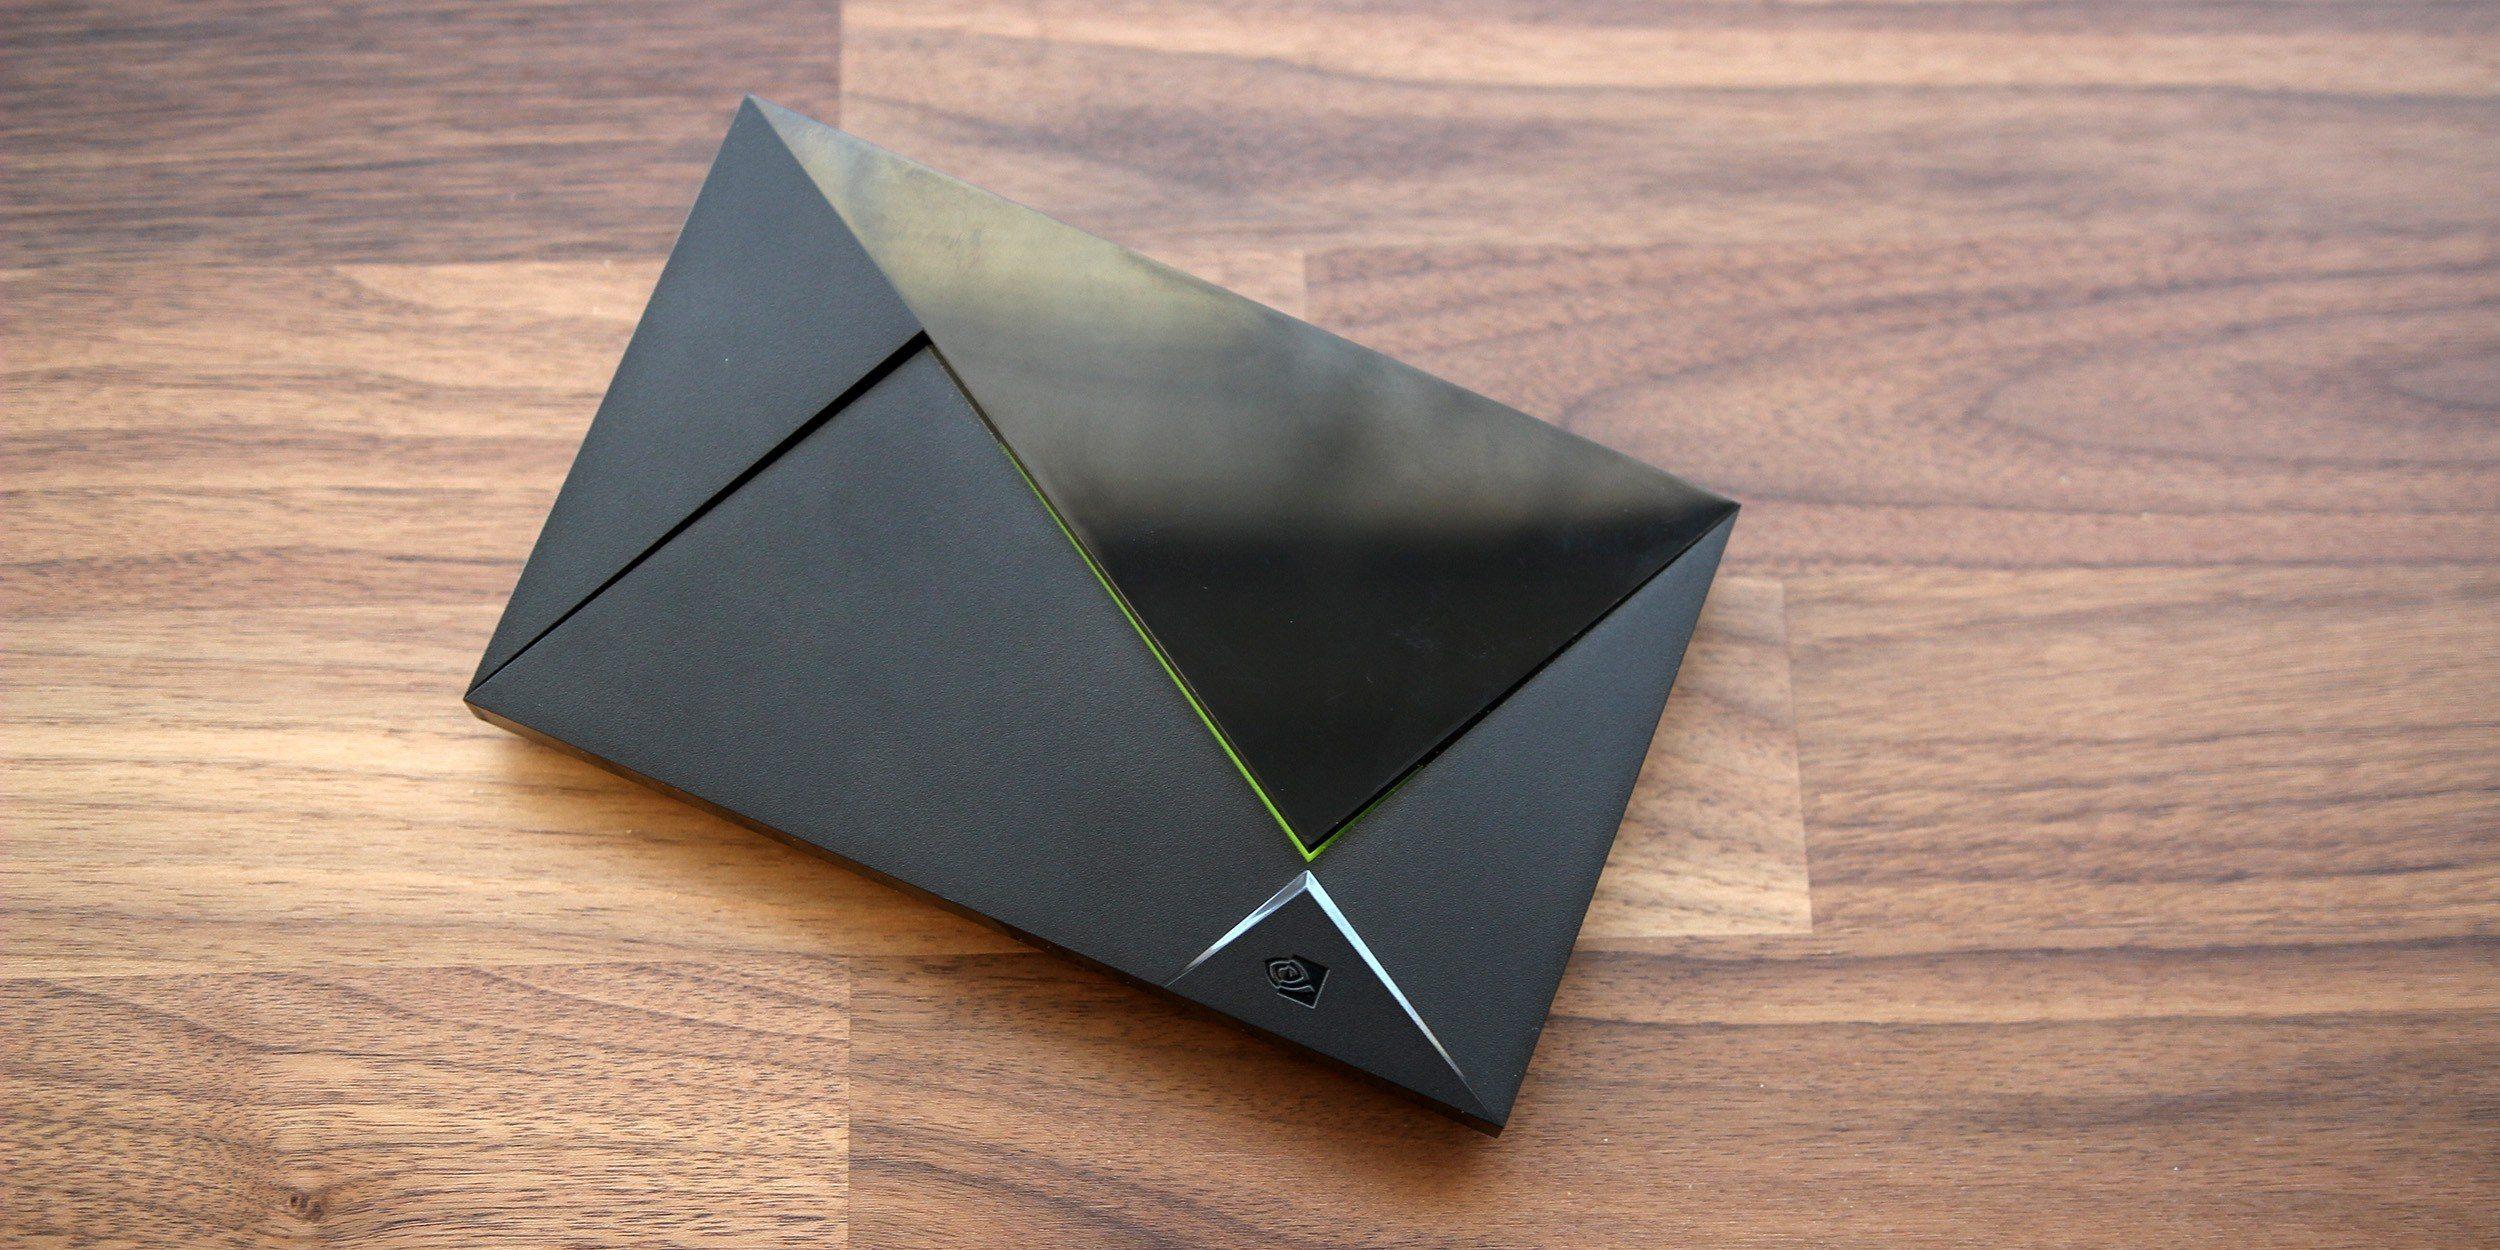 nvidia_shield_003.jpg